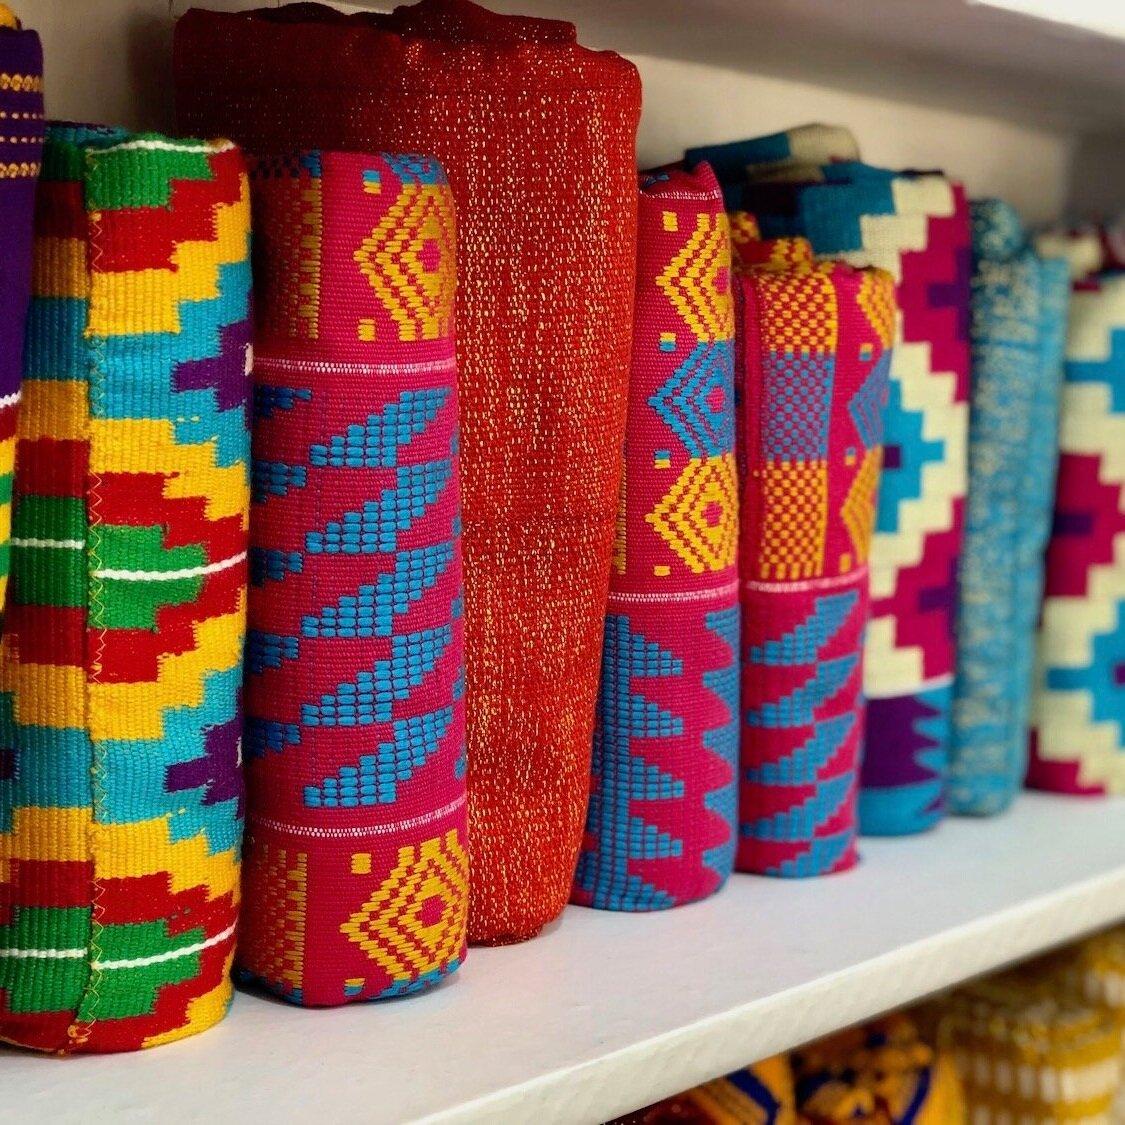 HAND-WOVEN CLOTH - Kente & Batakari from Ghana